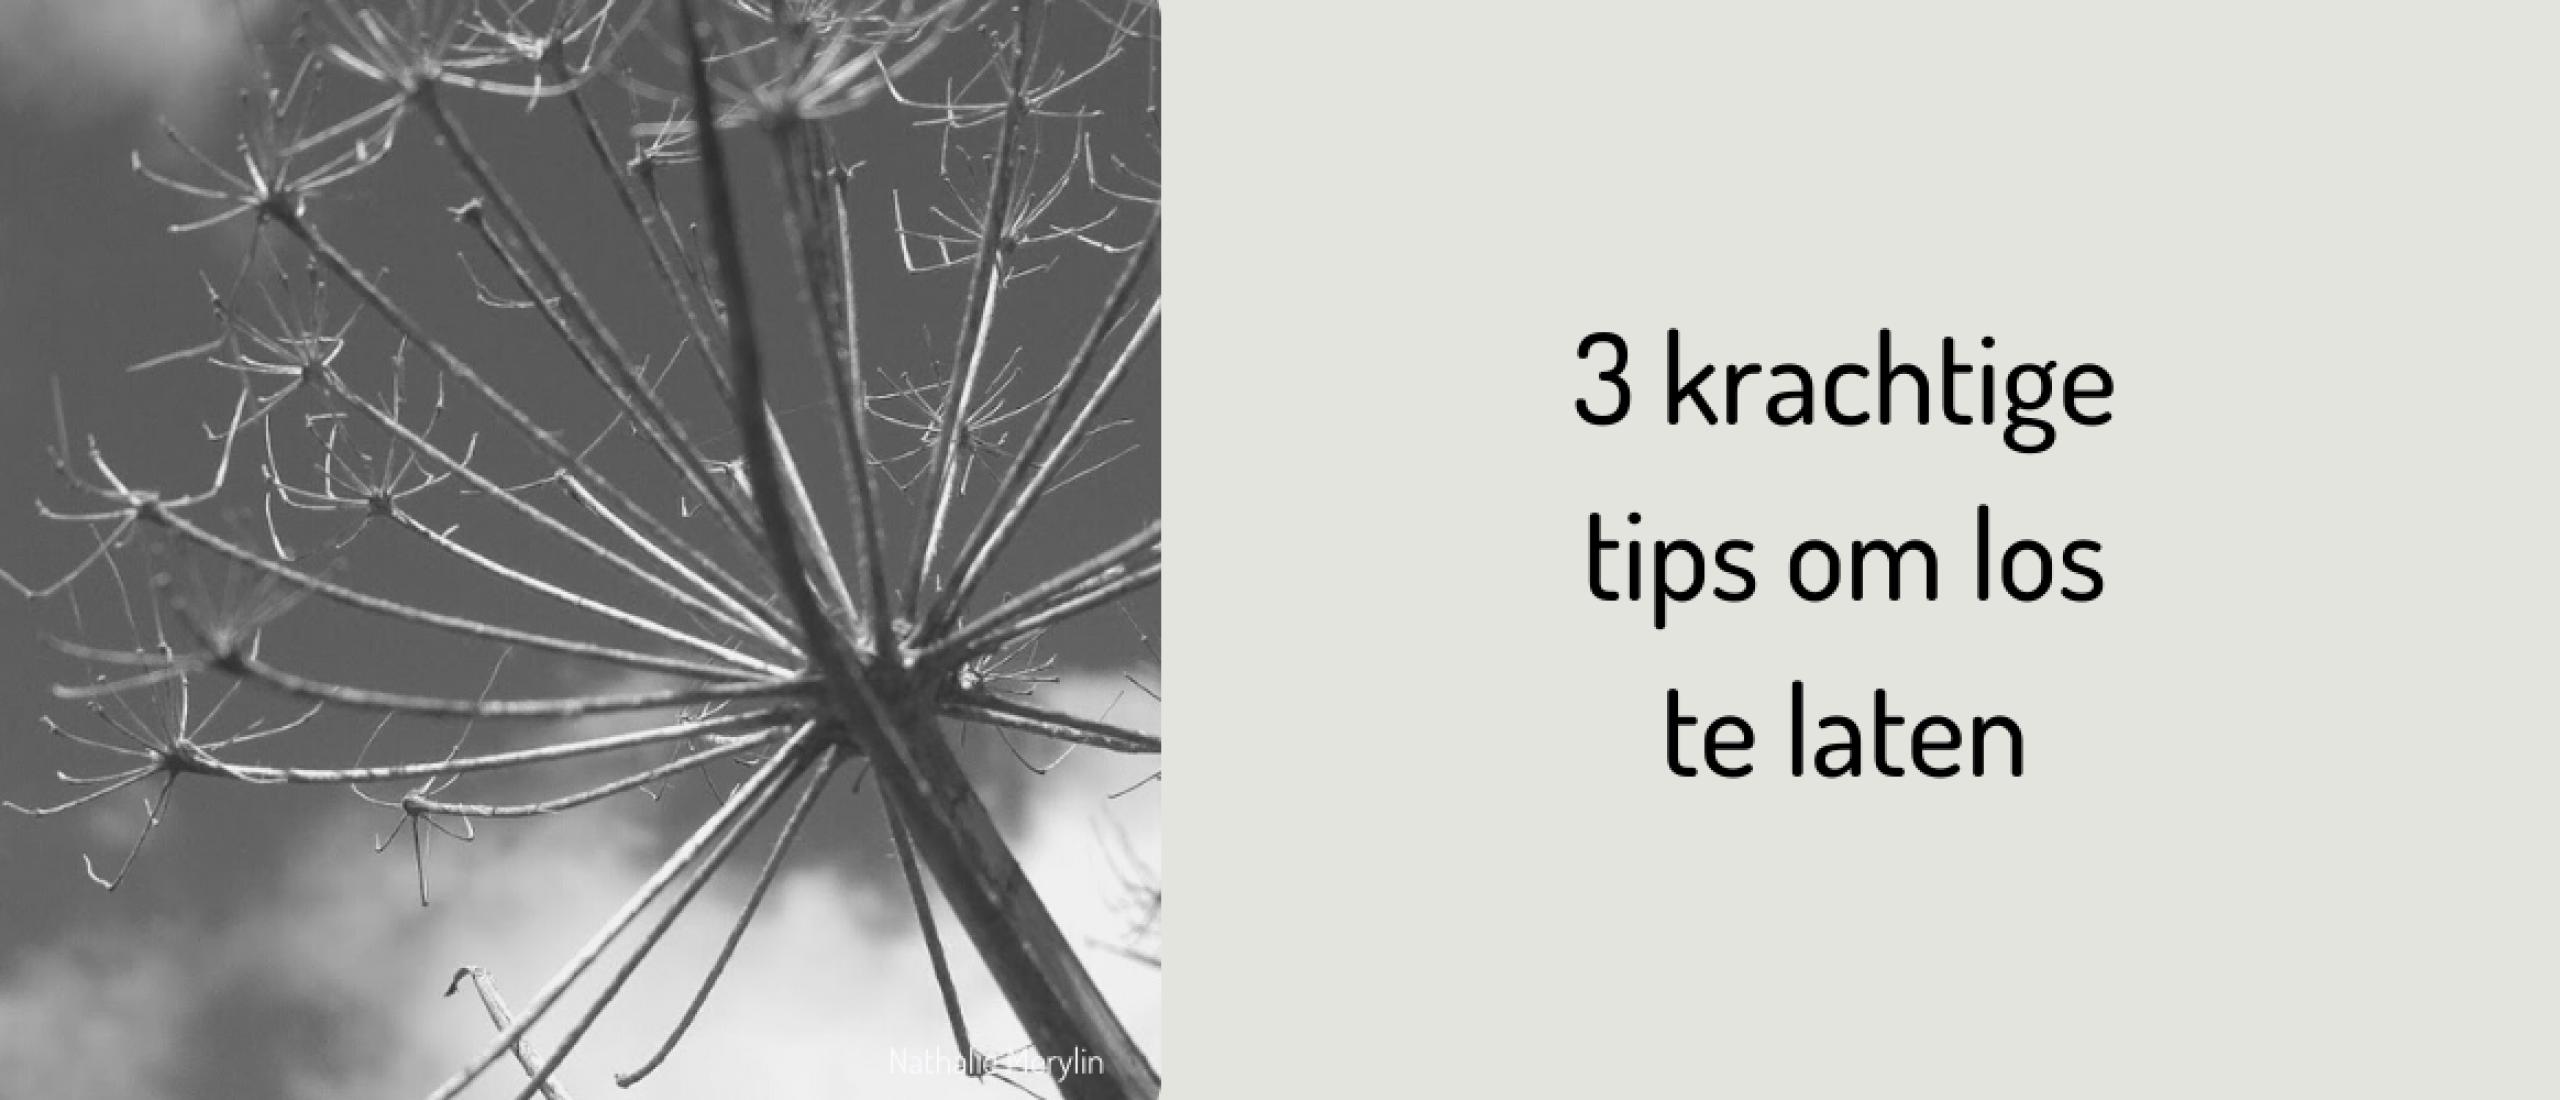 3 krachtige tips om los te laten